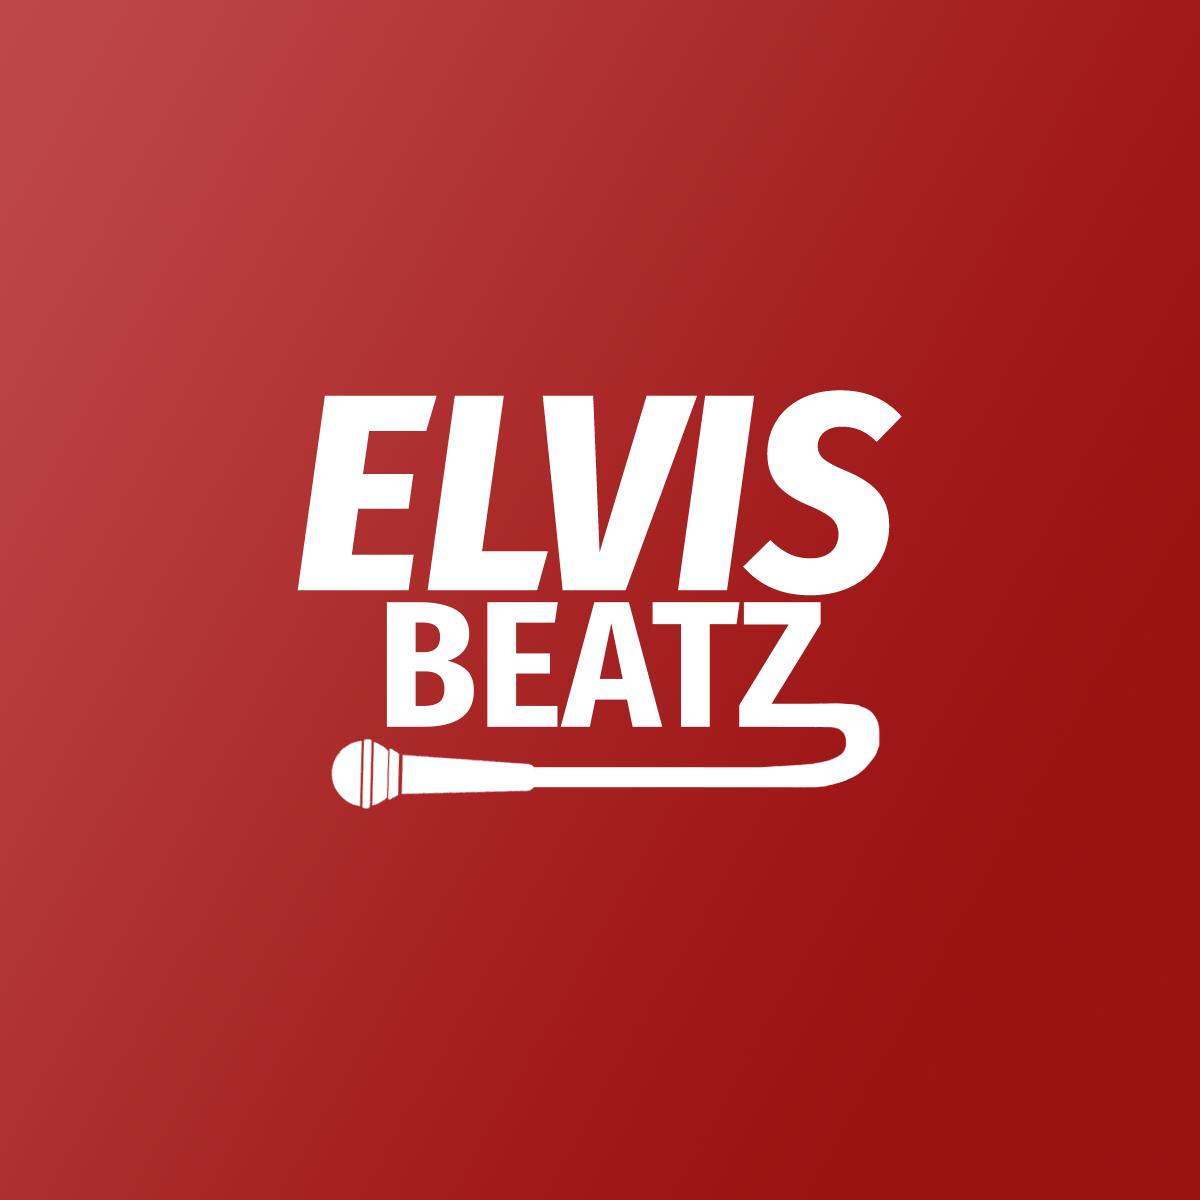 Elvis Beatz